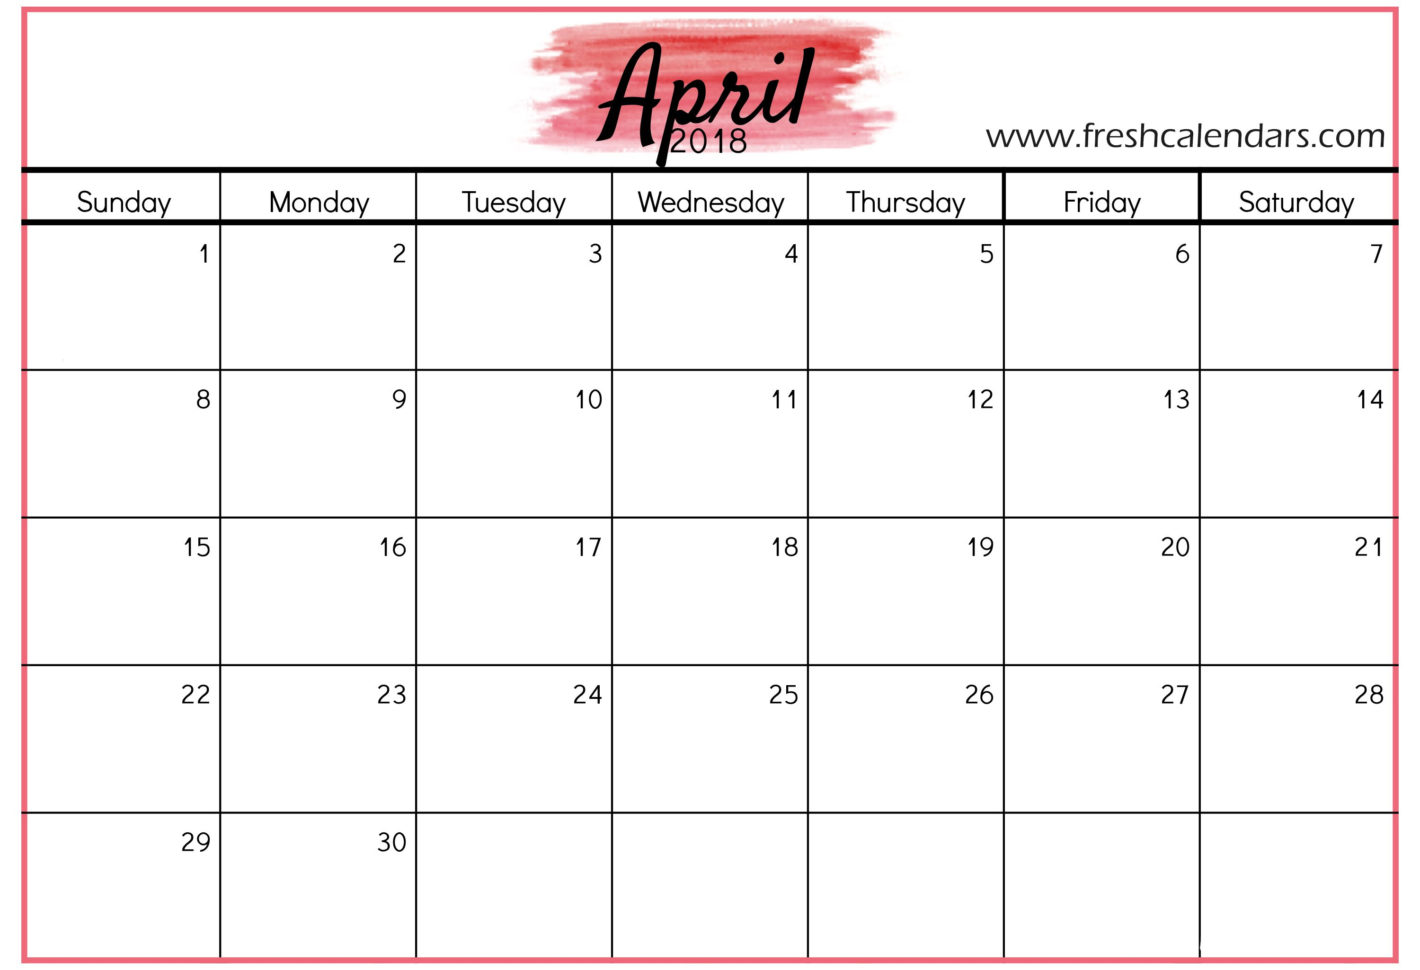 Calendar Spreadsheet 2018 Intended For April 2018 Calendar Printable Templates